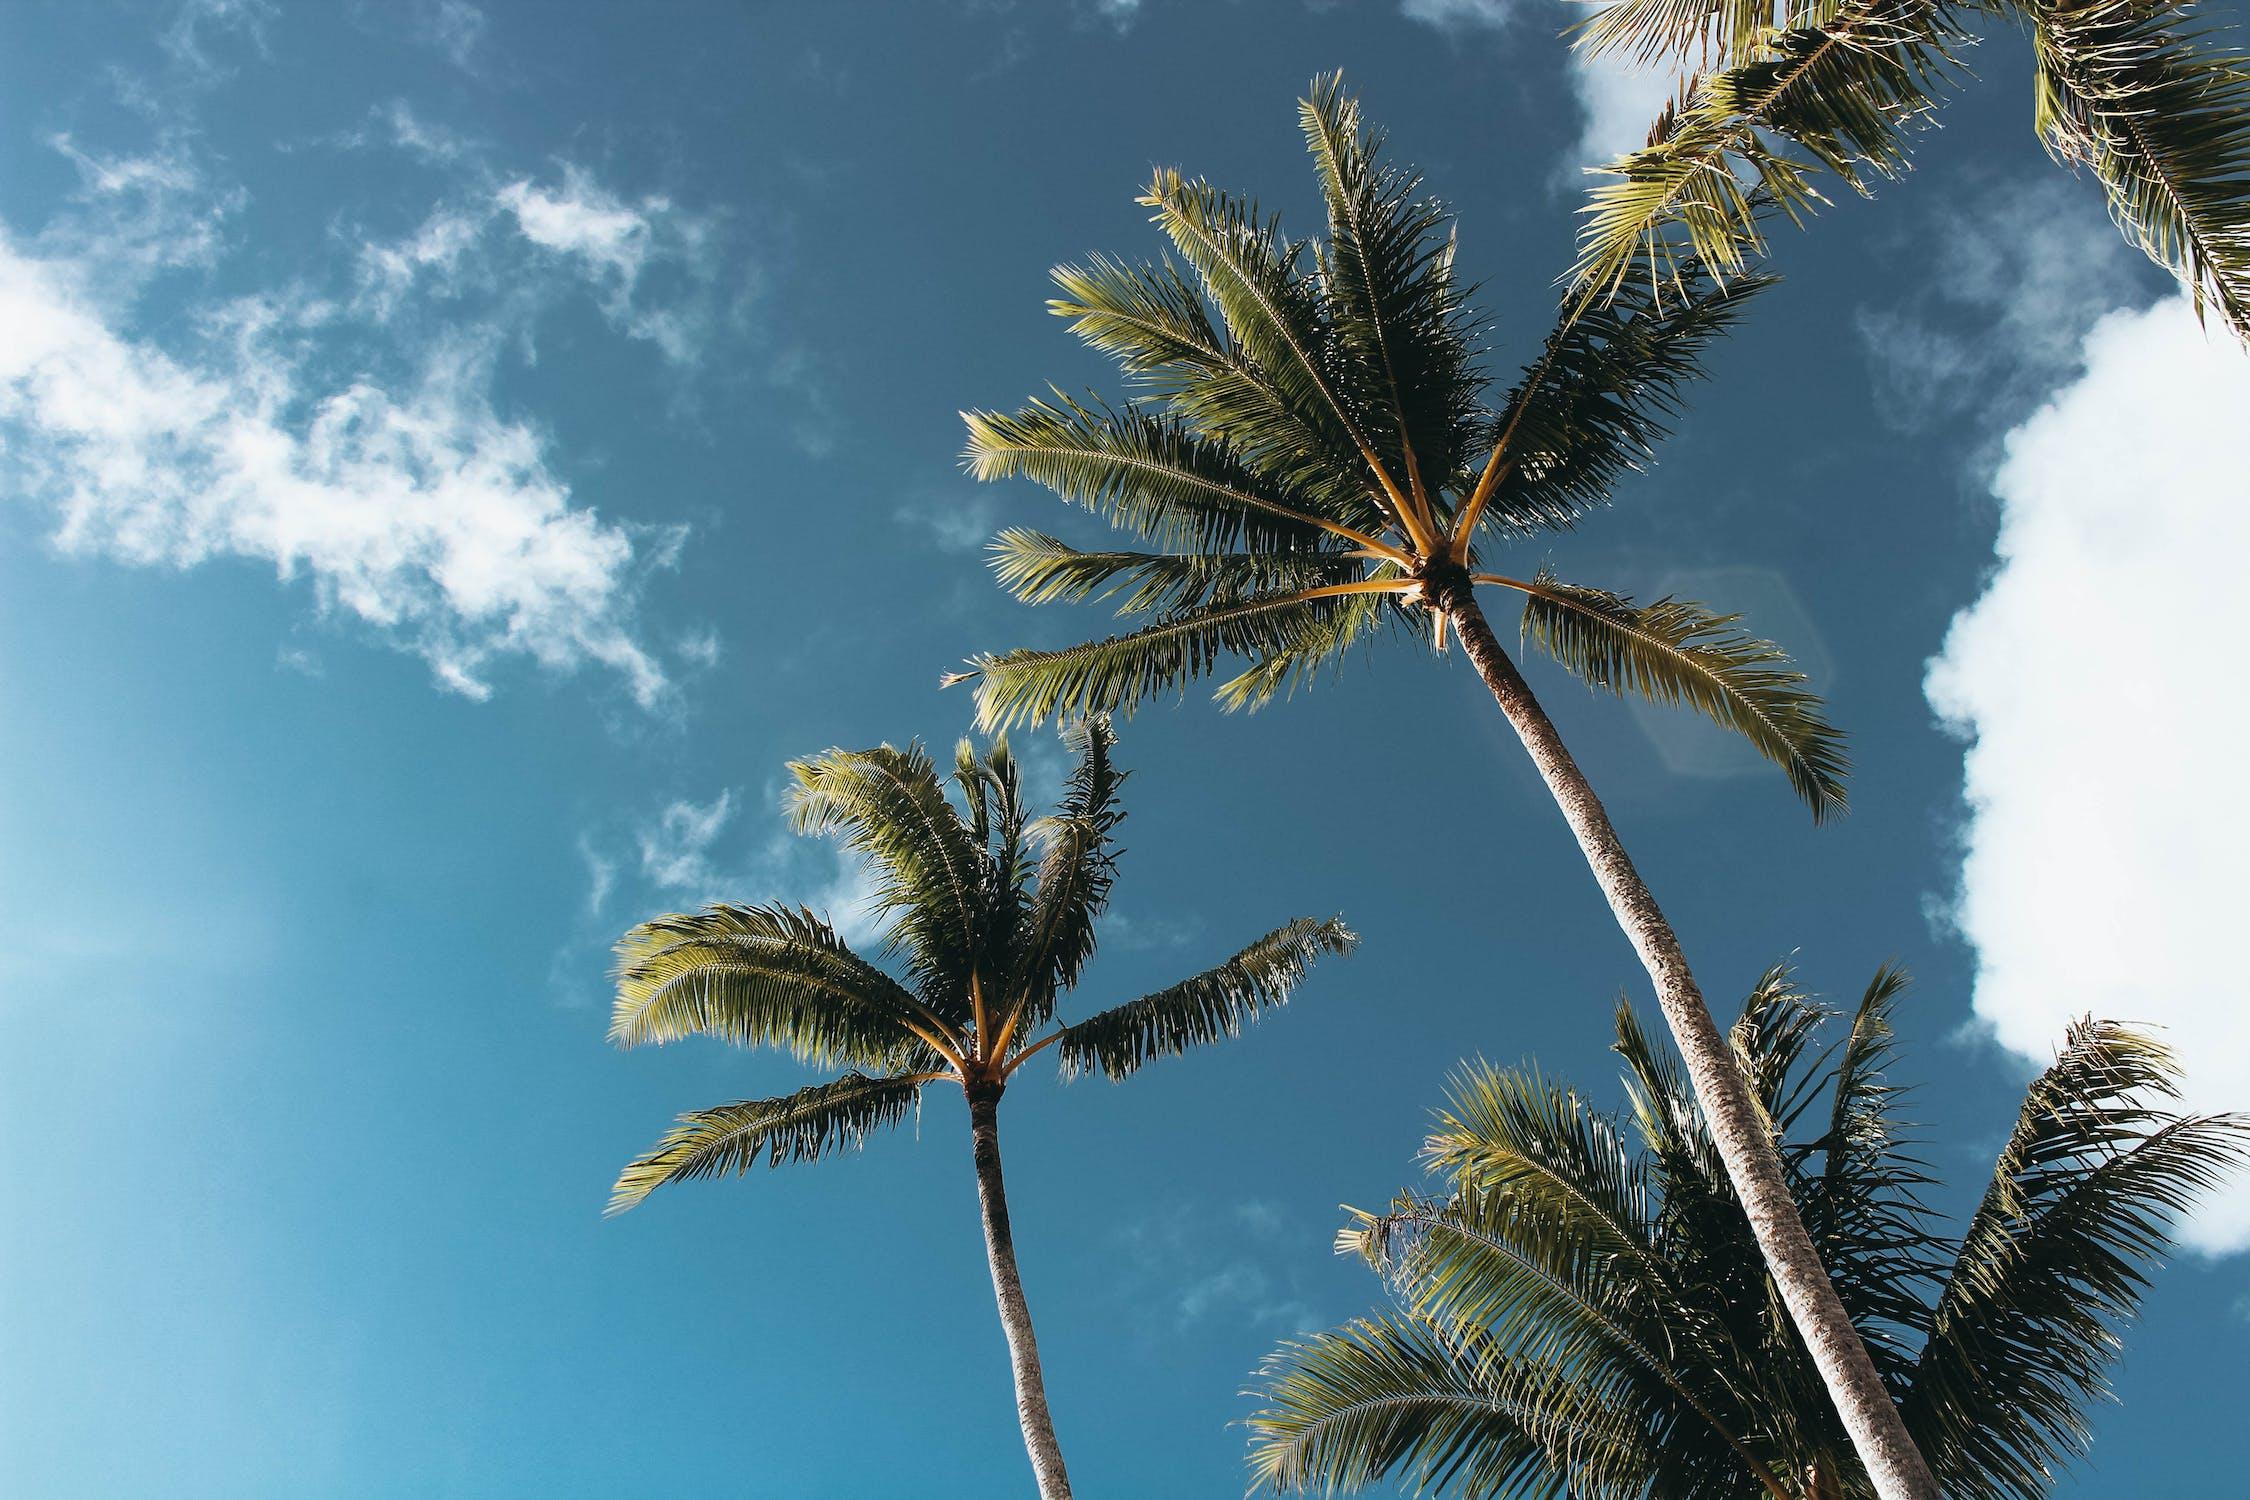 Miami and LA Rethink Their Iconic Palm Trees